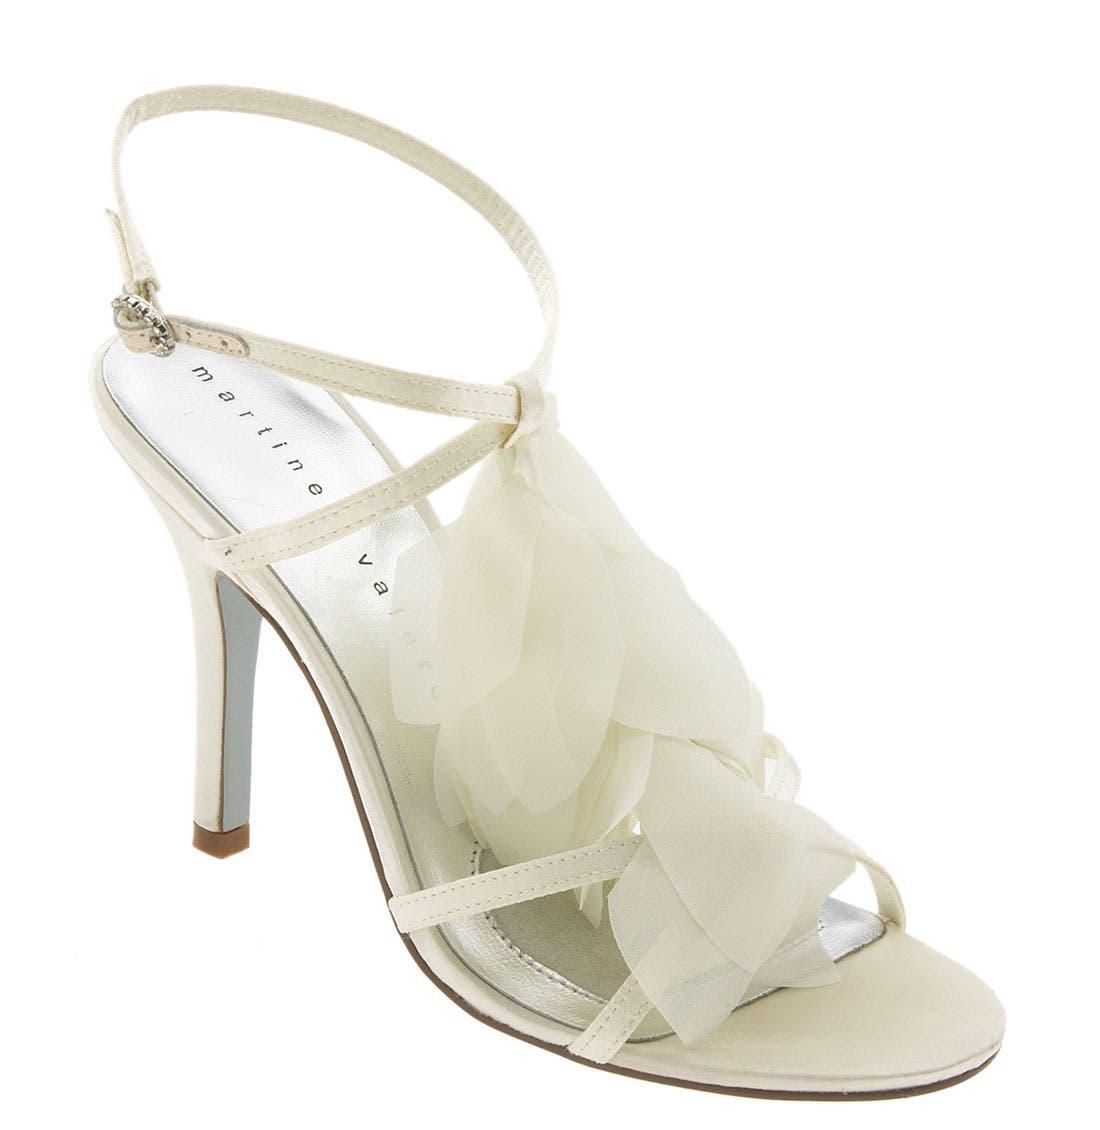 Main Image - Martinez Valero 'Corrine' Sandal